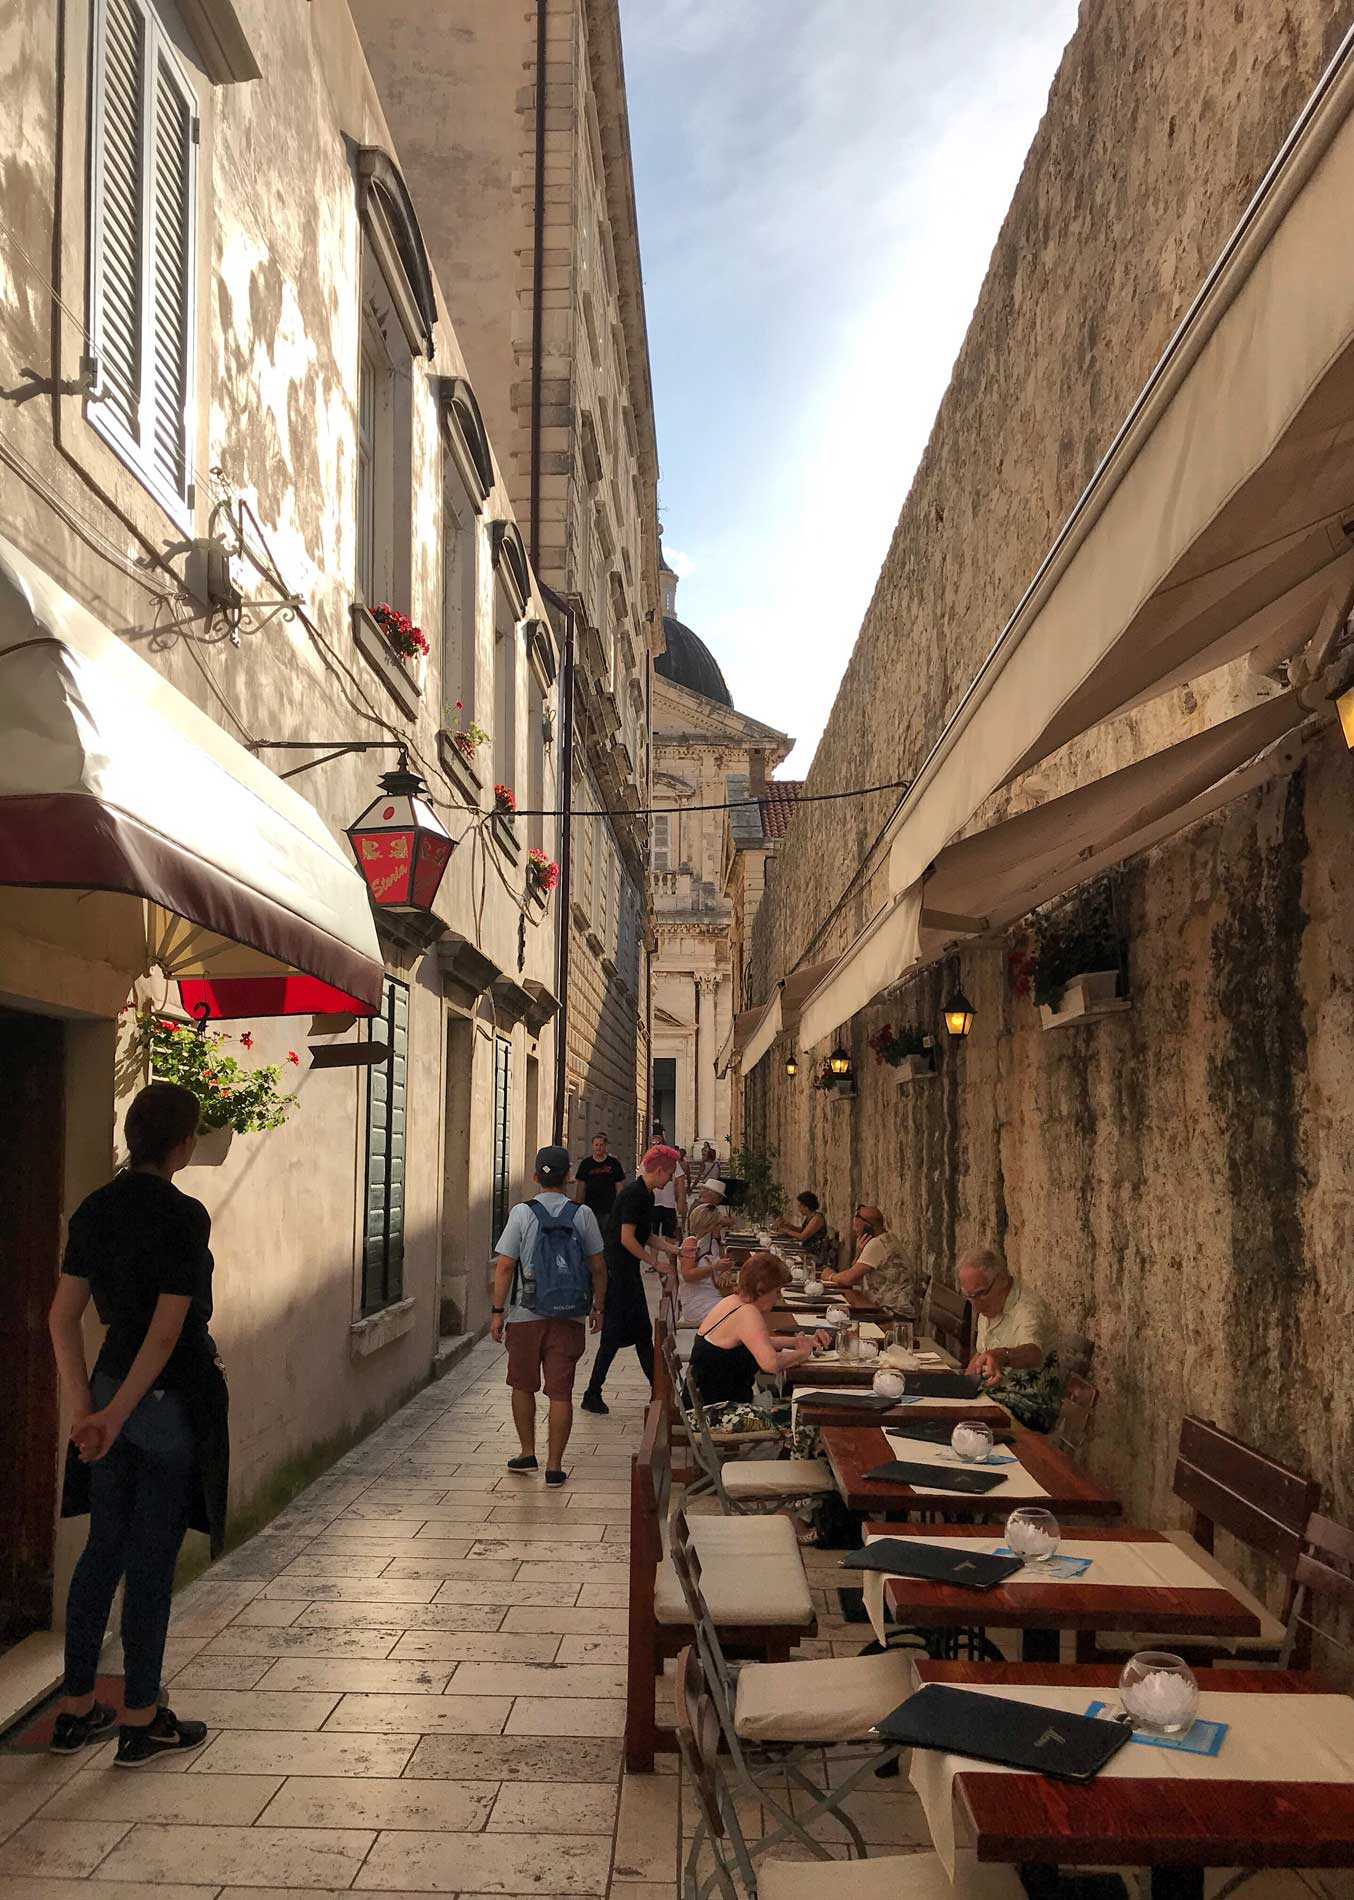 Dubrovnik-Croazia-stradina-tavolini-turisti-cameriere-Cattedrale